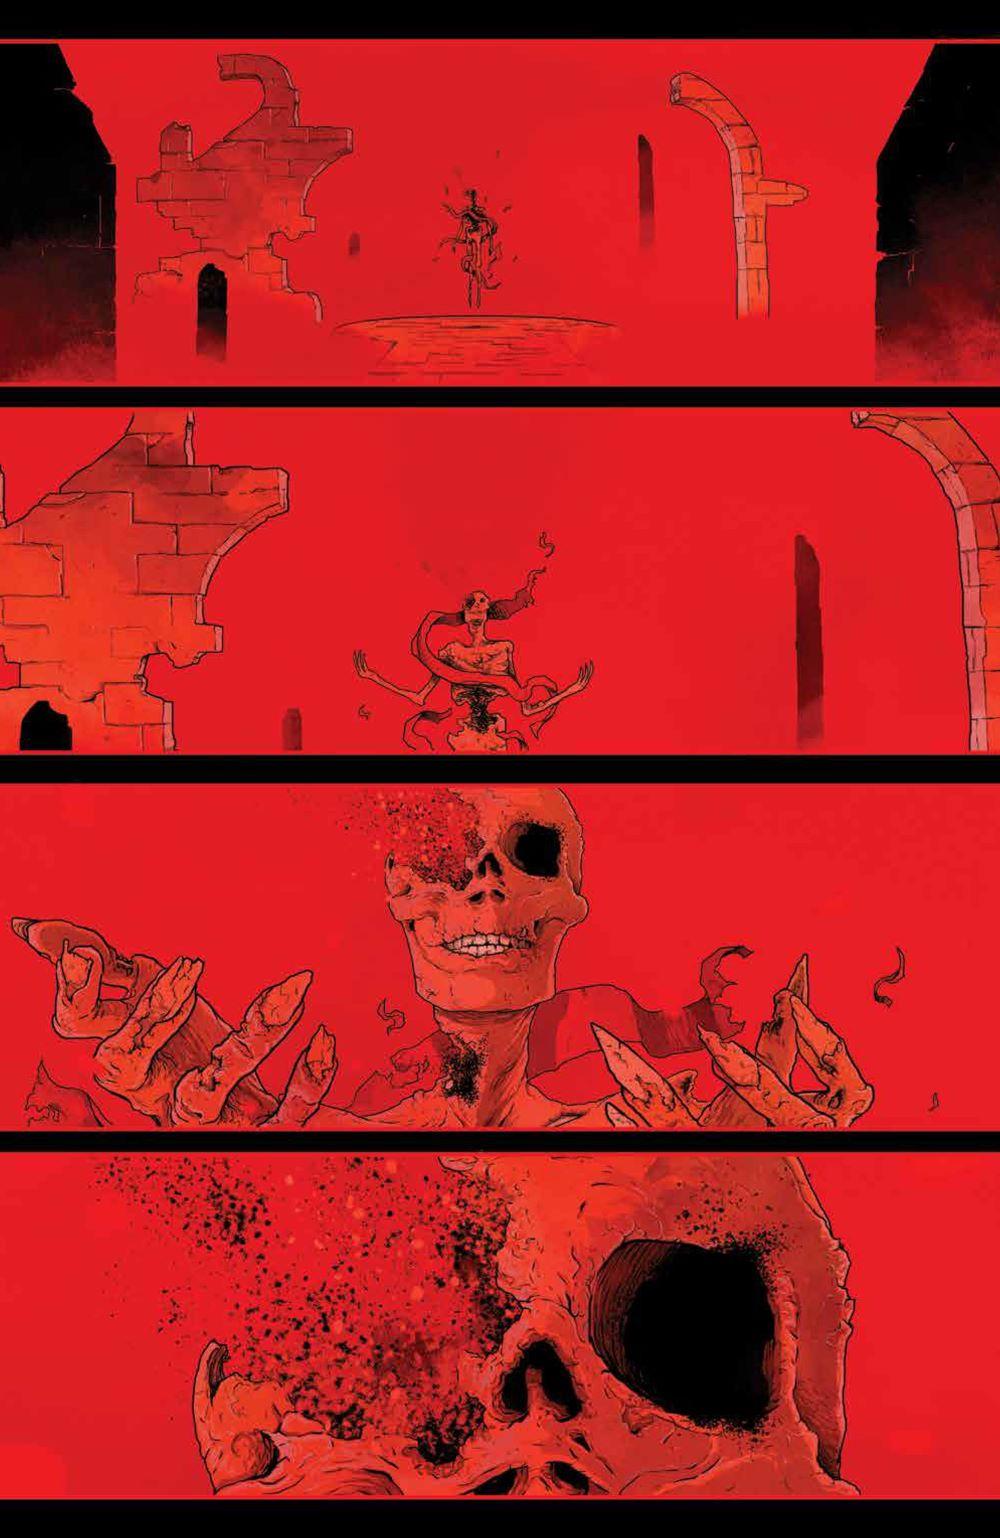 RedMother_v1_SC_PRESS_9 ComicList Previews: RED MOTHER VOLUME 1 TP